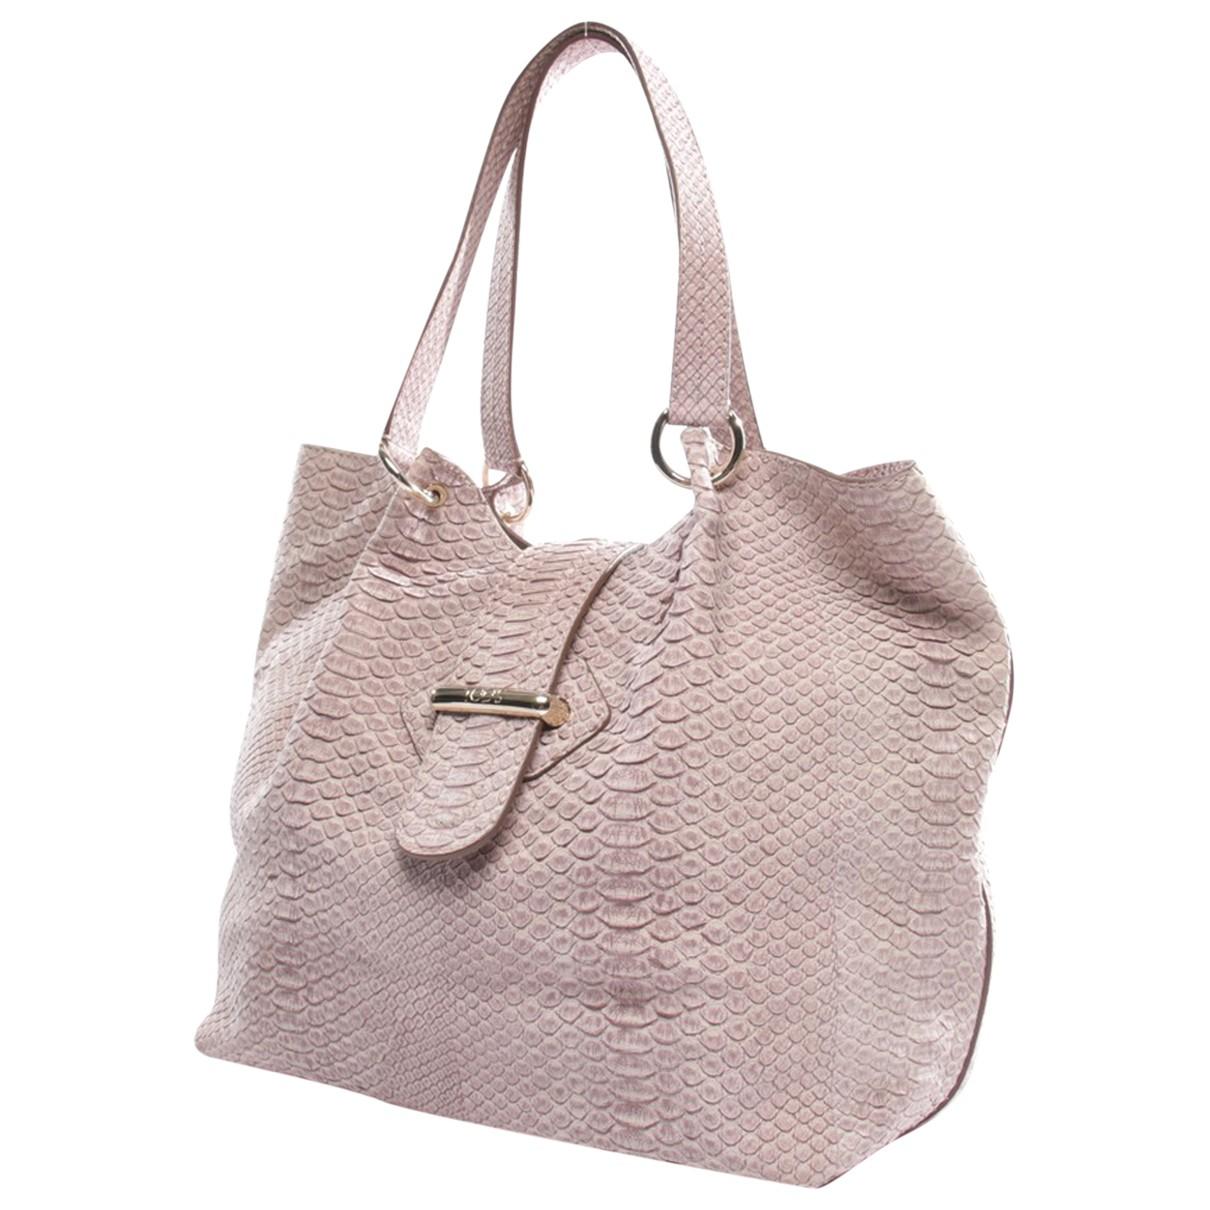 Tod's \N Purple Leather handbag for Women \N